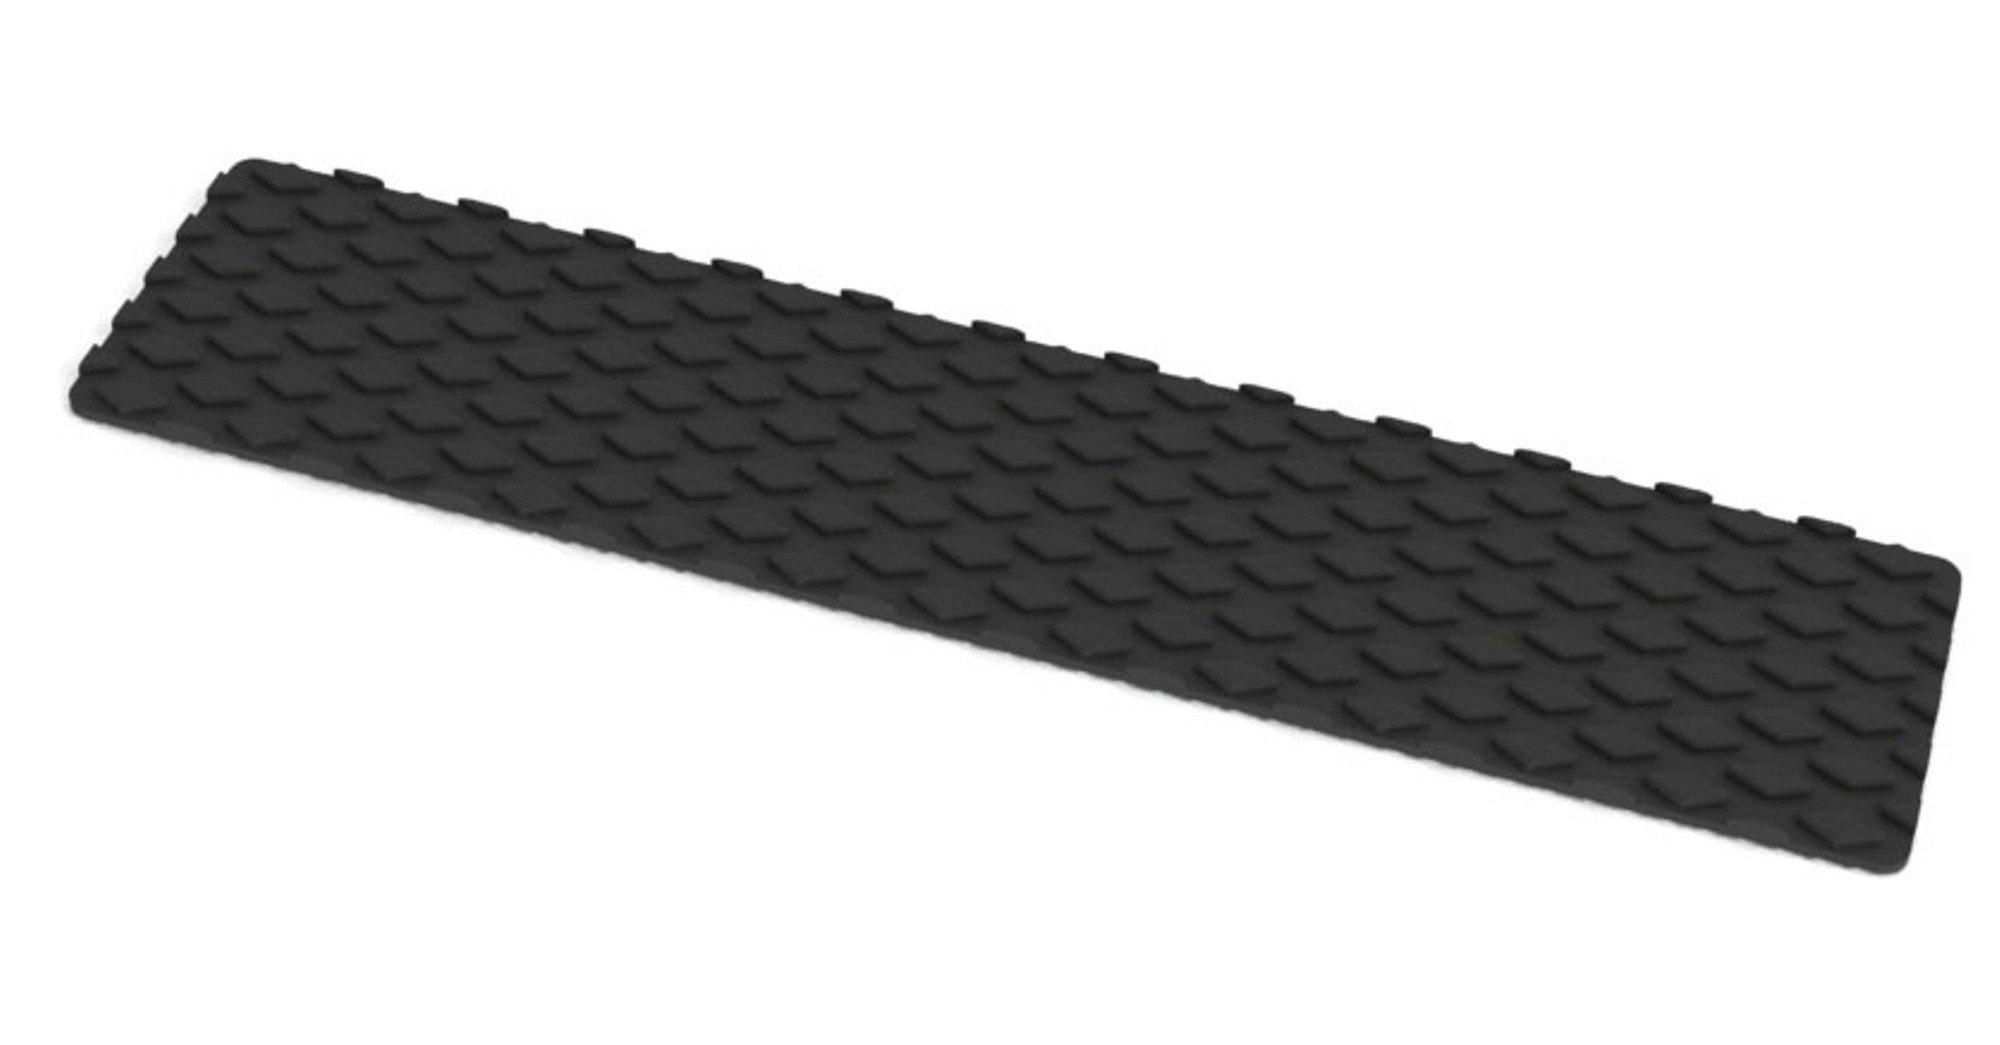 Highland 1041400 Sure Step Self-Stick Rubber Mat 2 Pack